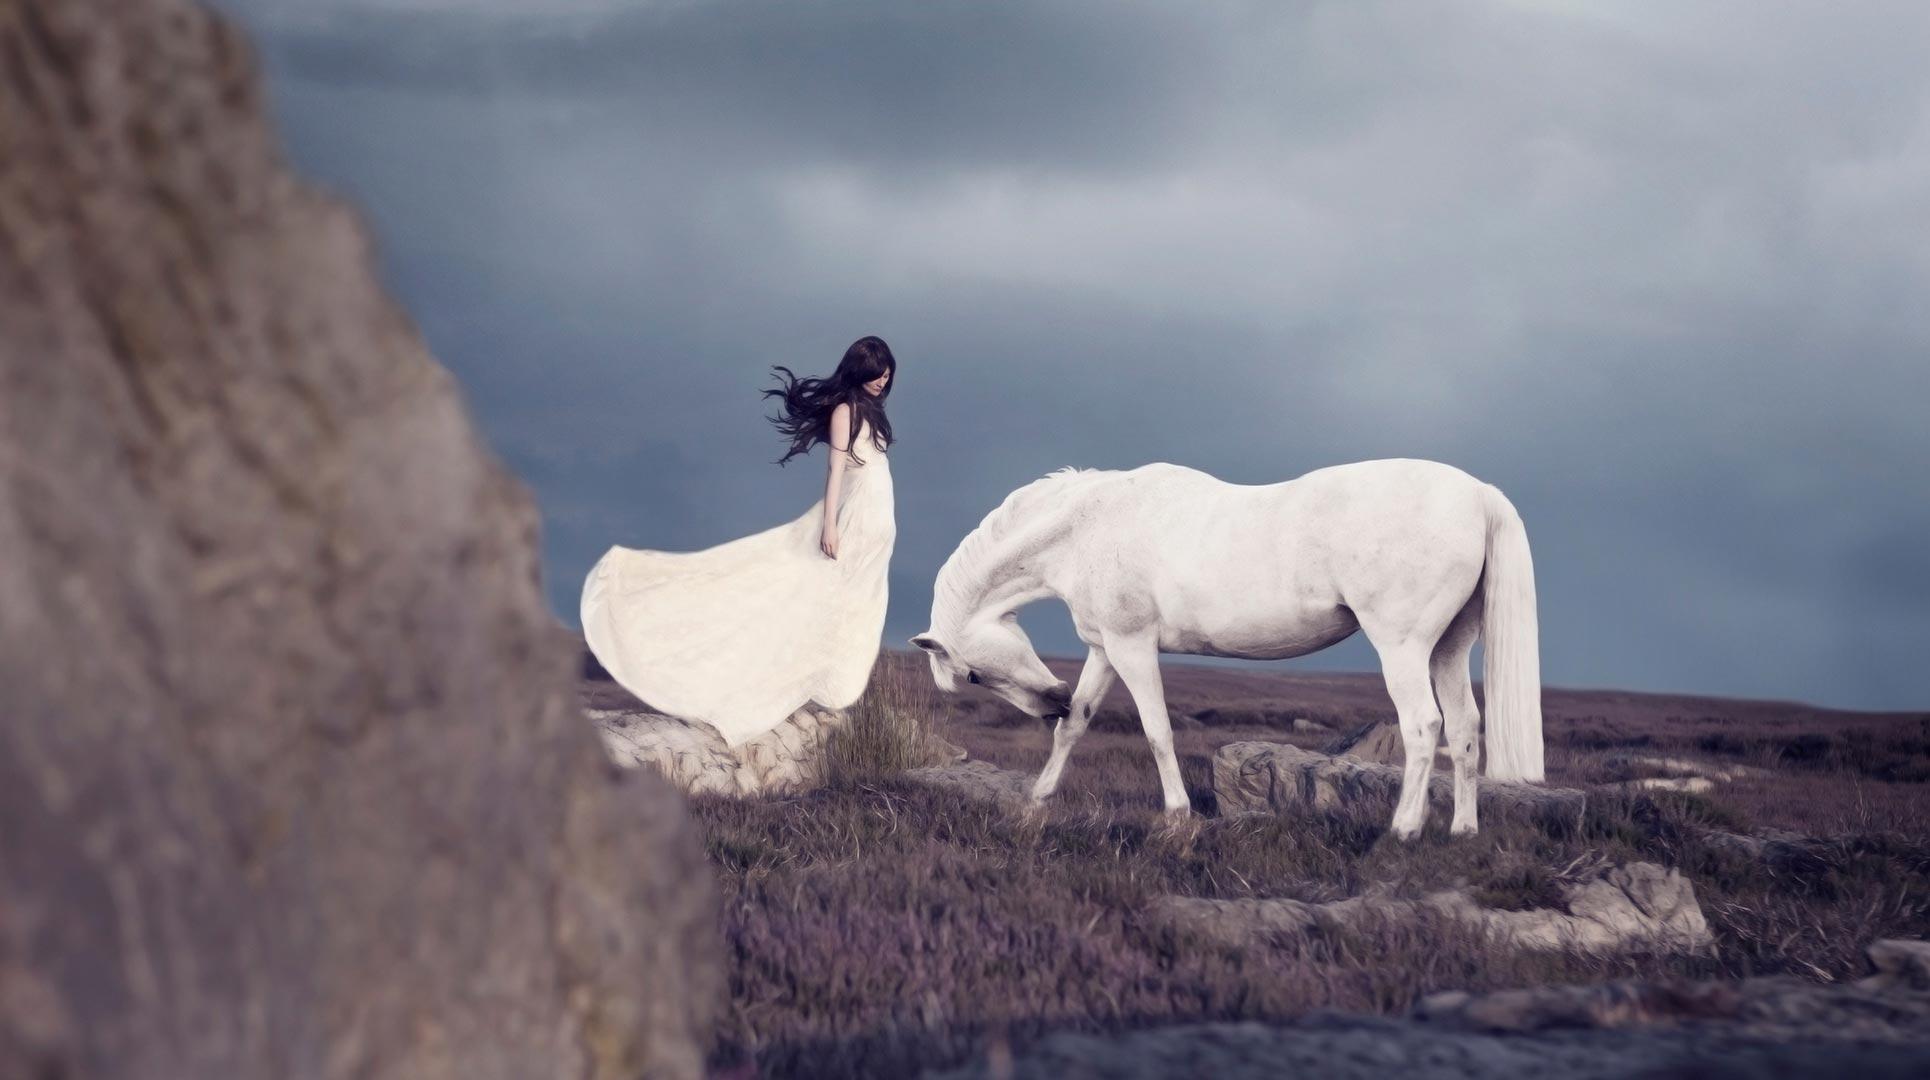 Nicola_Taylor_Art_Photography_A_Hundred_Silent_Ways-